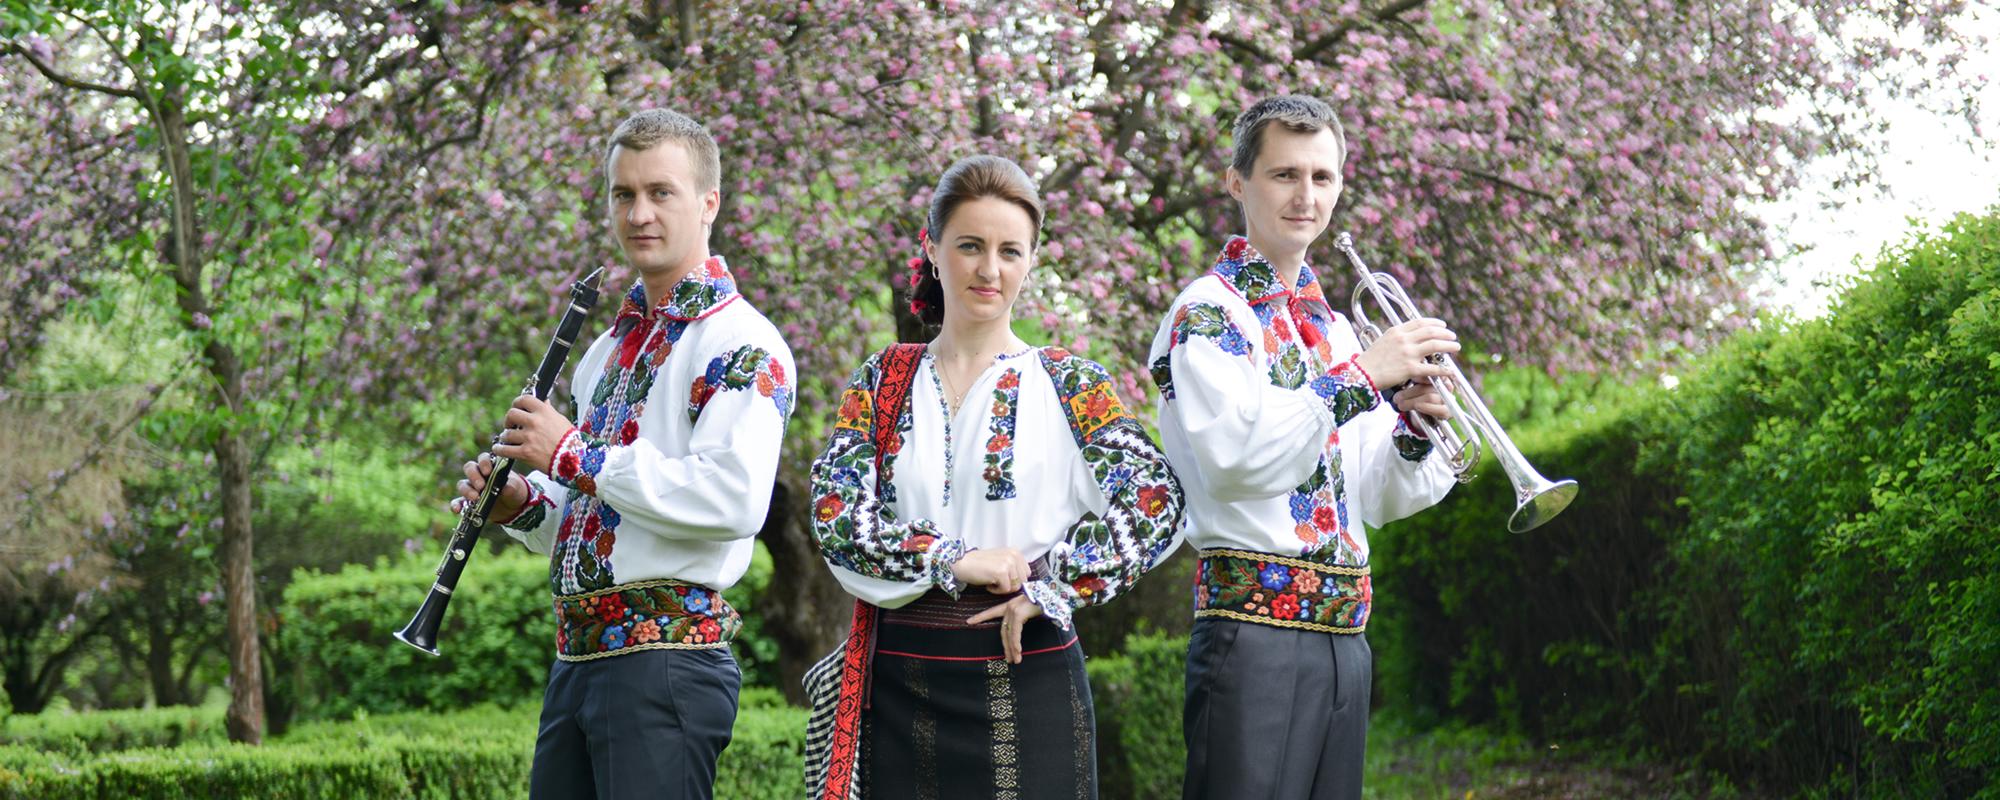 Fratii Micliuc Formatie De Nunta In Suceava